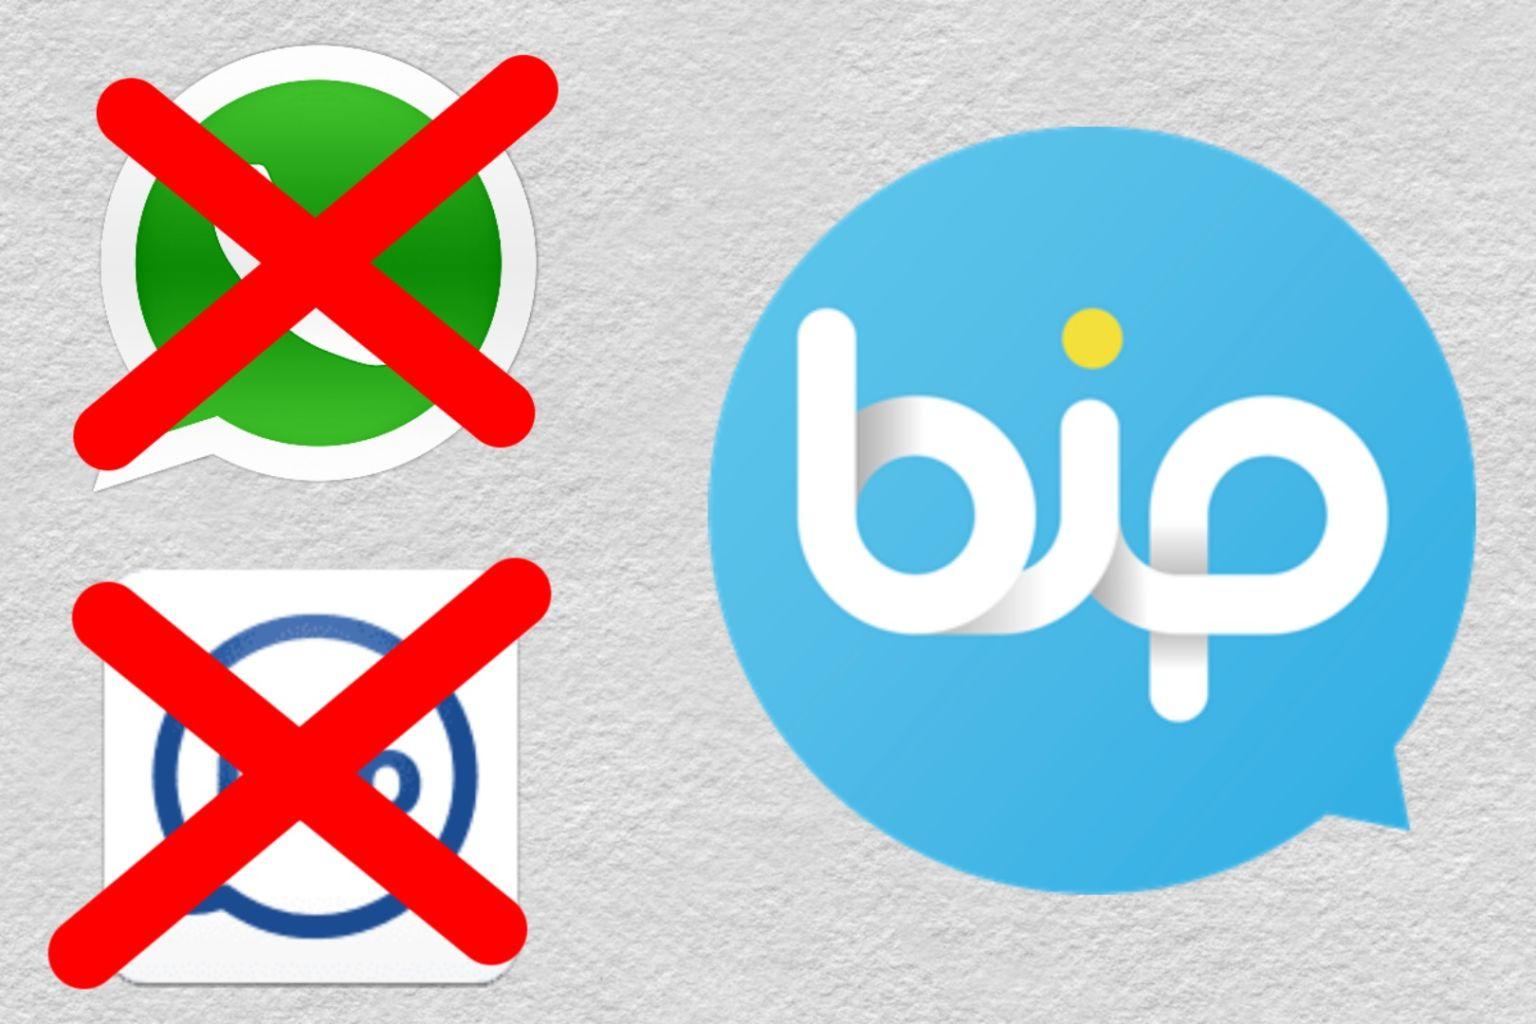 imo/whatsapp বর্জন করুন। তুরস্কের মুসলিমদের তৈরি অশ্লীলতা মুক্ত BiP–Messaging, Voice and Video Calling অ্যাপ ব্যাবহার শুরু করুন।